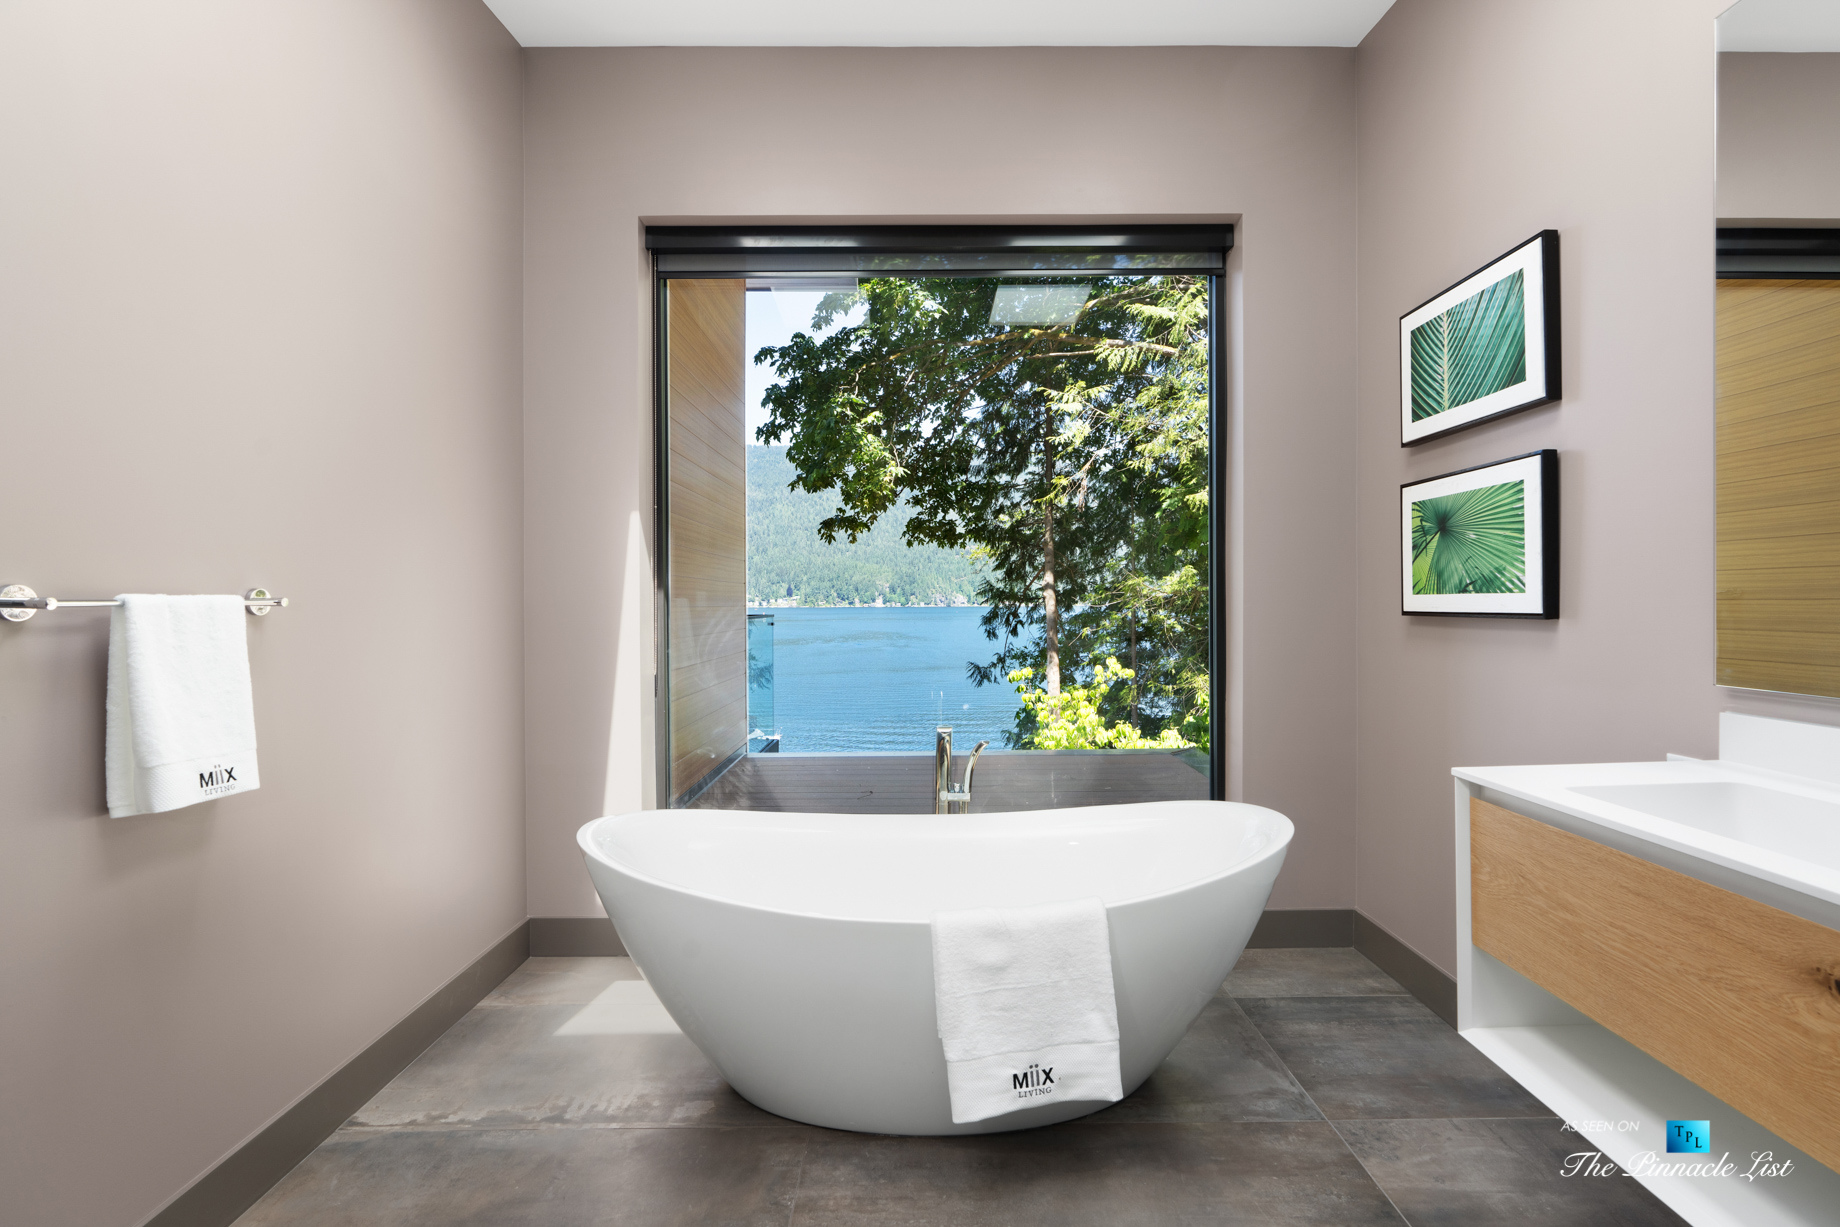 3350 Watson Rd, Belcarra, BC, Canada - Vancouver Luxury Real Estate - Oceanview Modern Master Bathroom Freestanding Tub